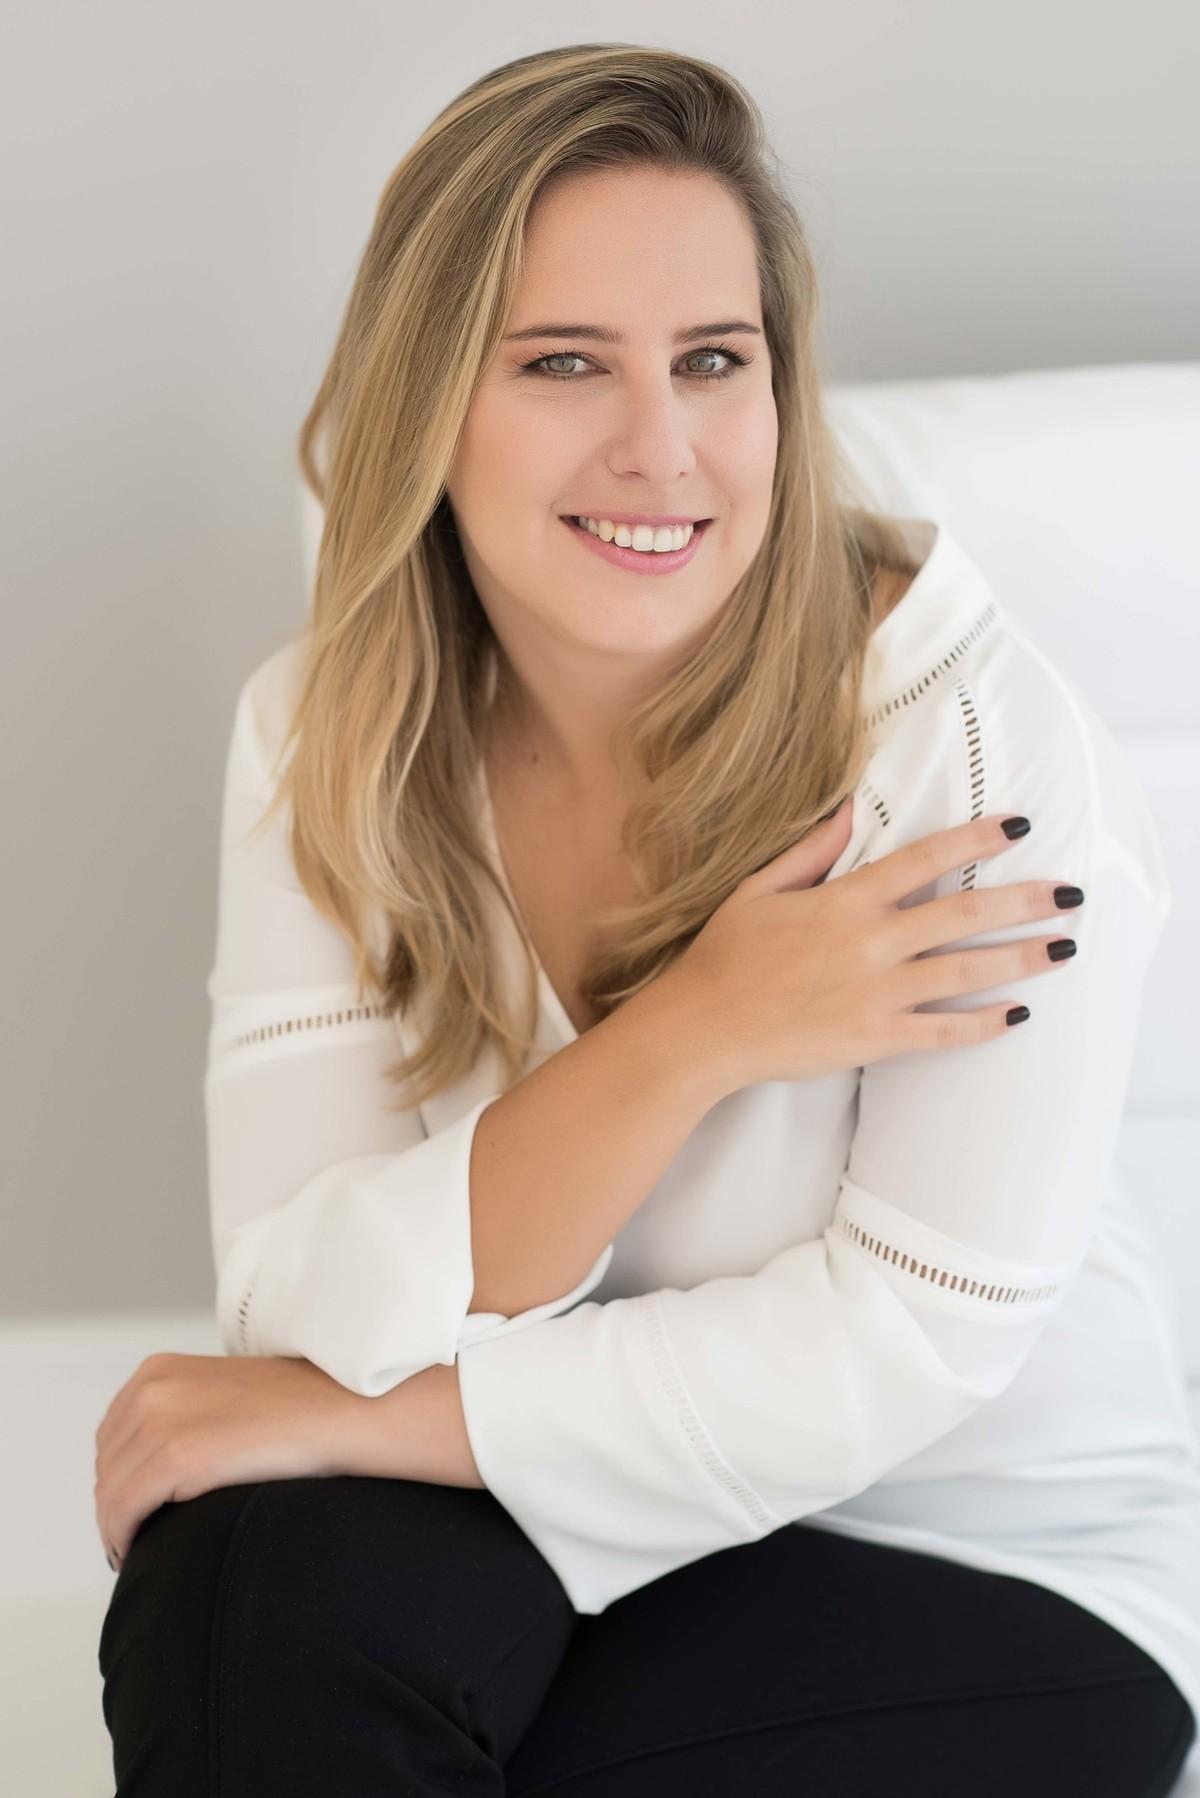 Ensaio fotográfico - perfil profissional - estúdio - empresária